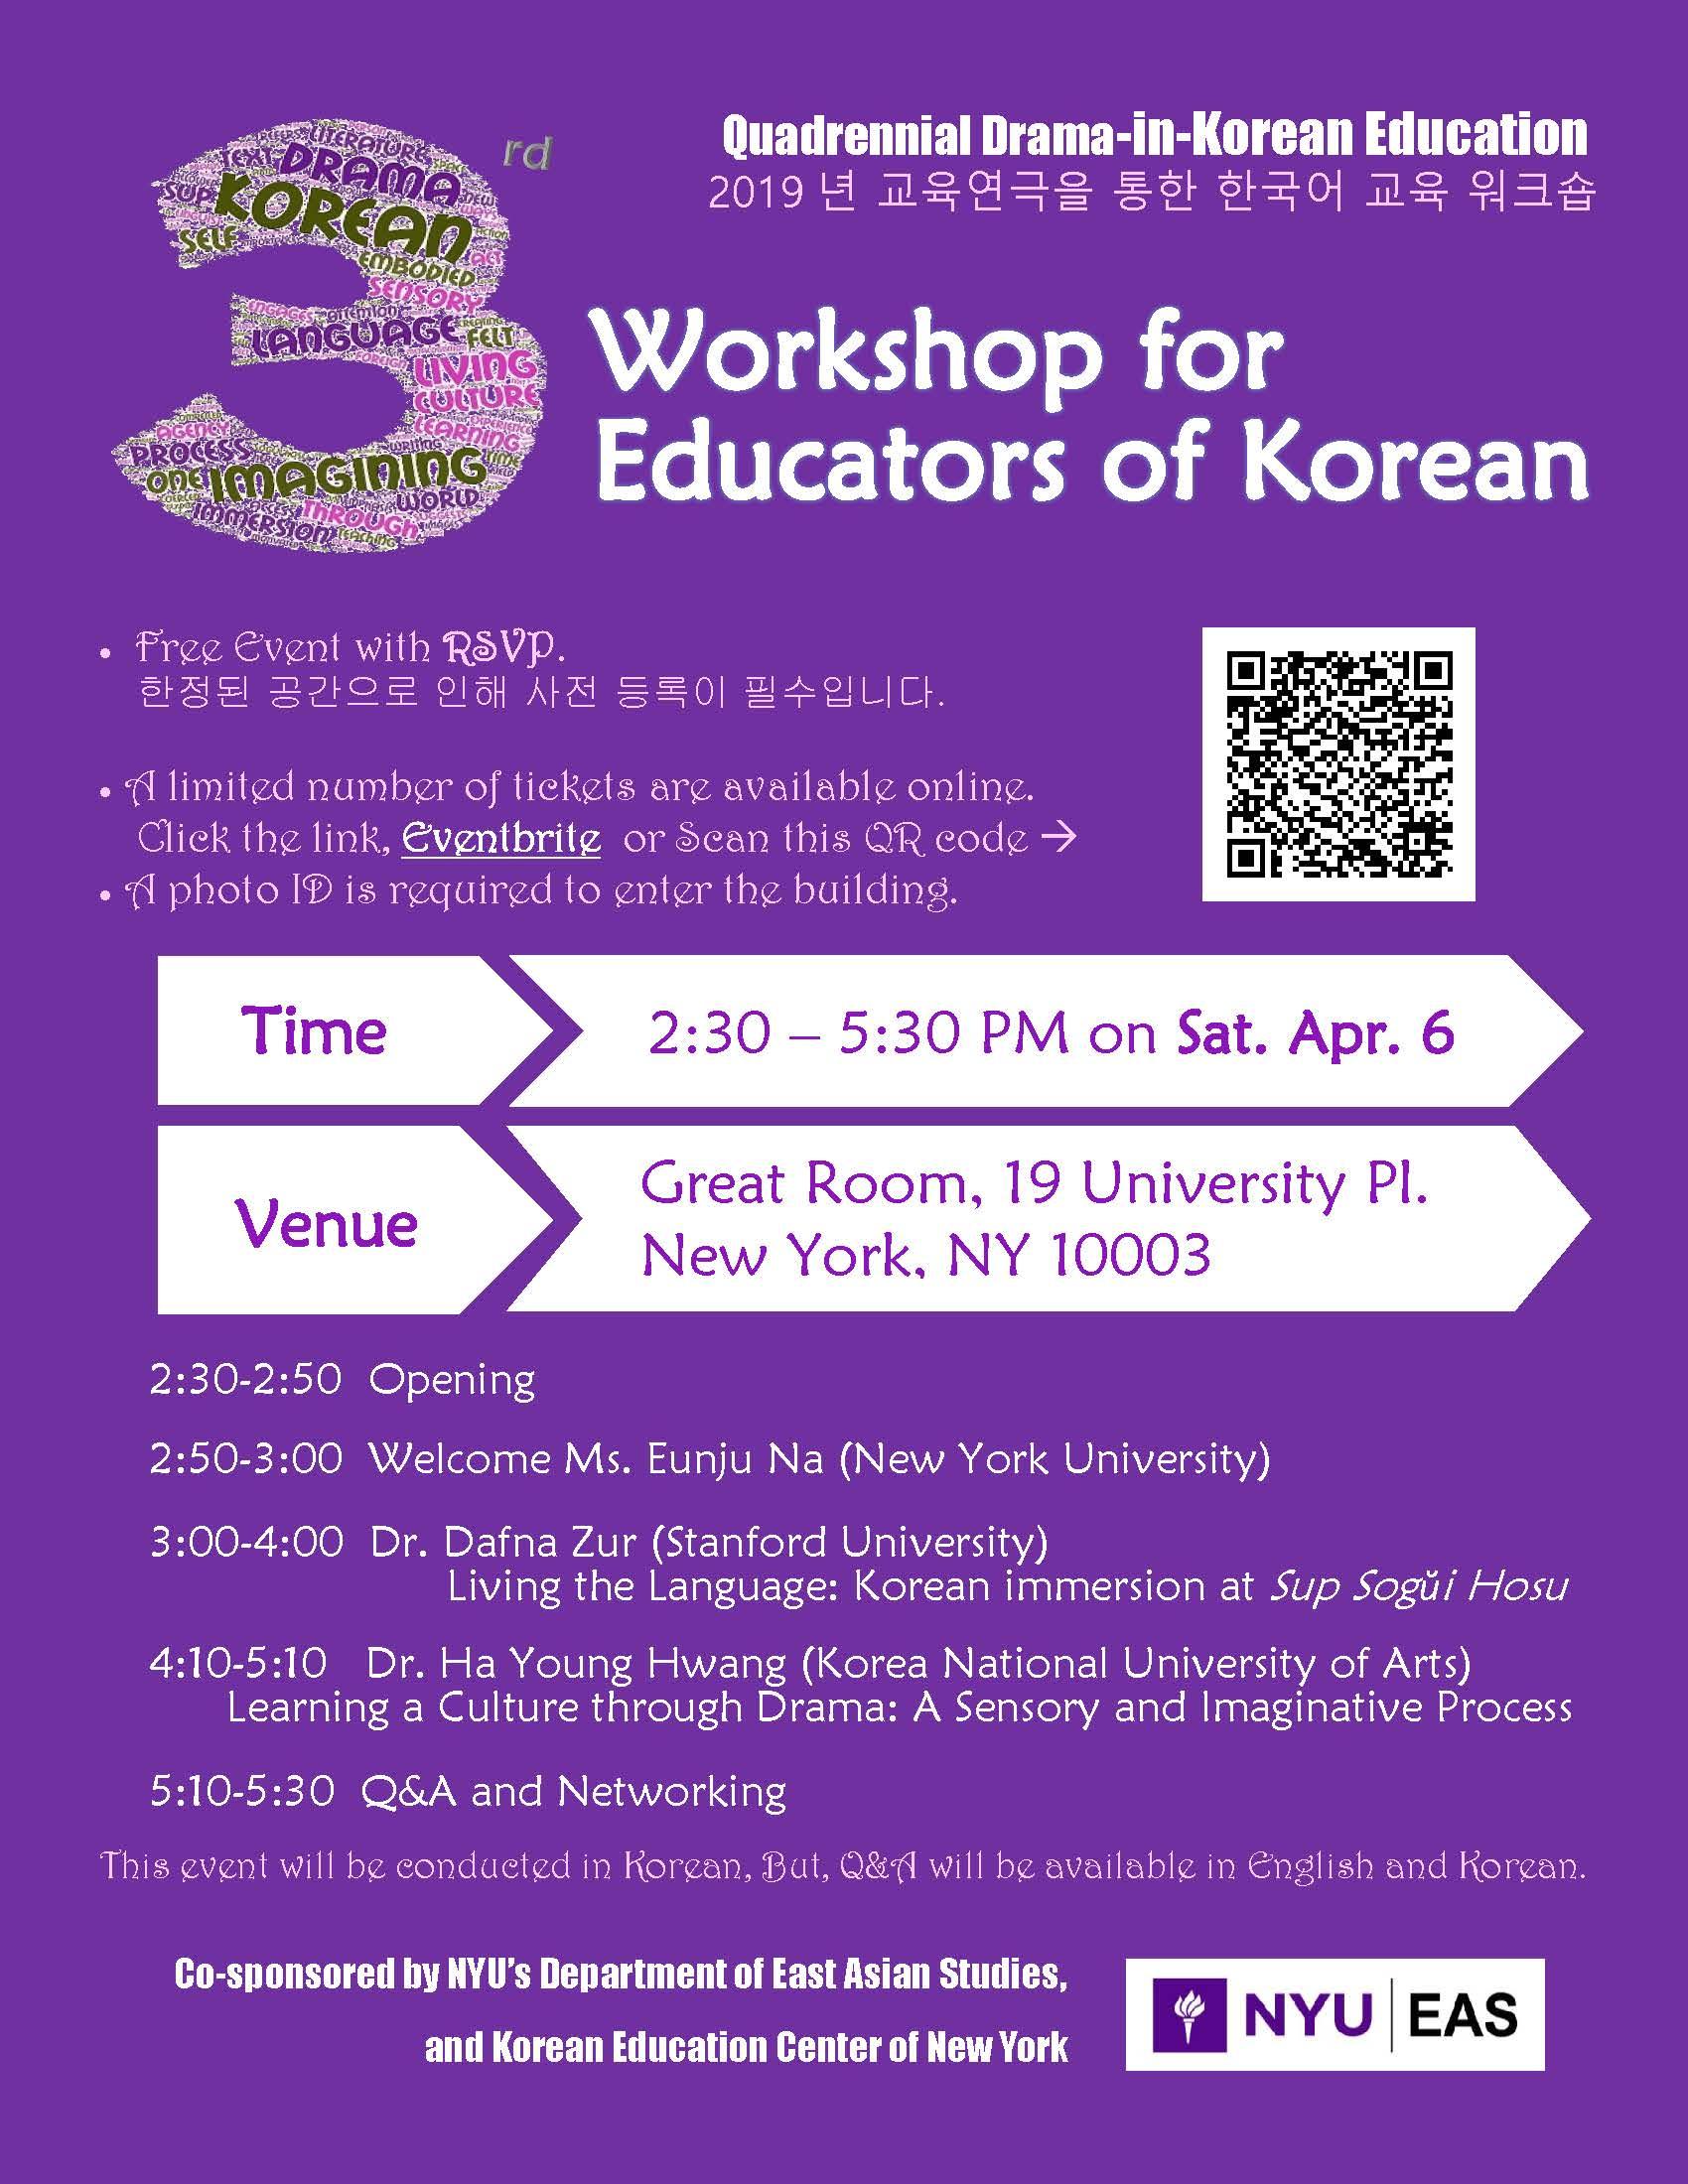 Flyer_3rd Drama-in-Korean Education Workshop for Educators.jpg